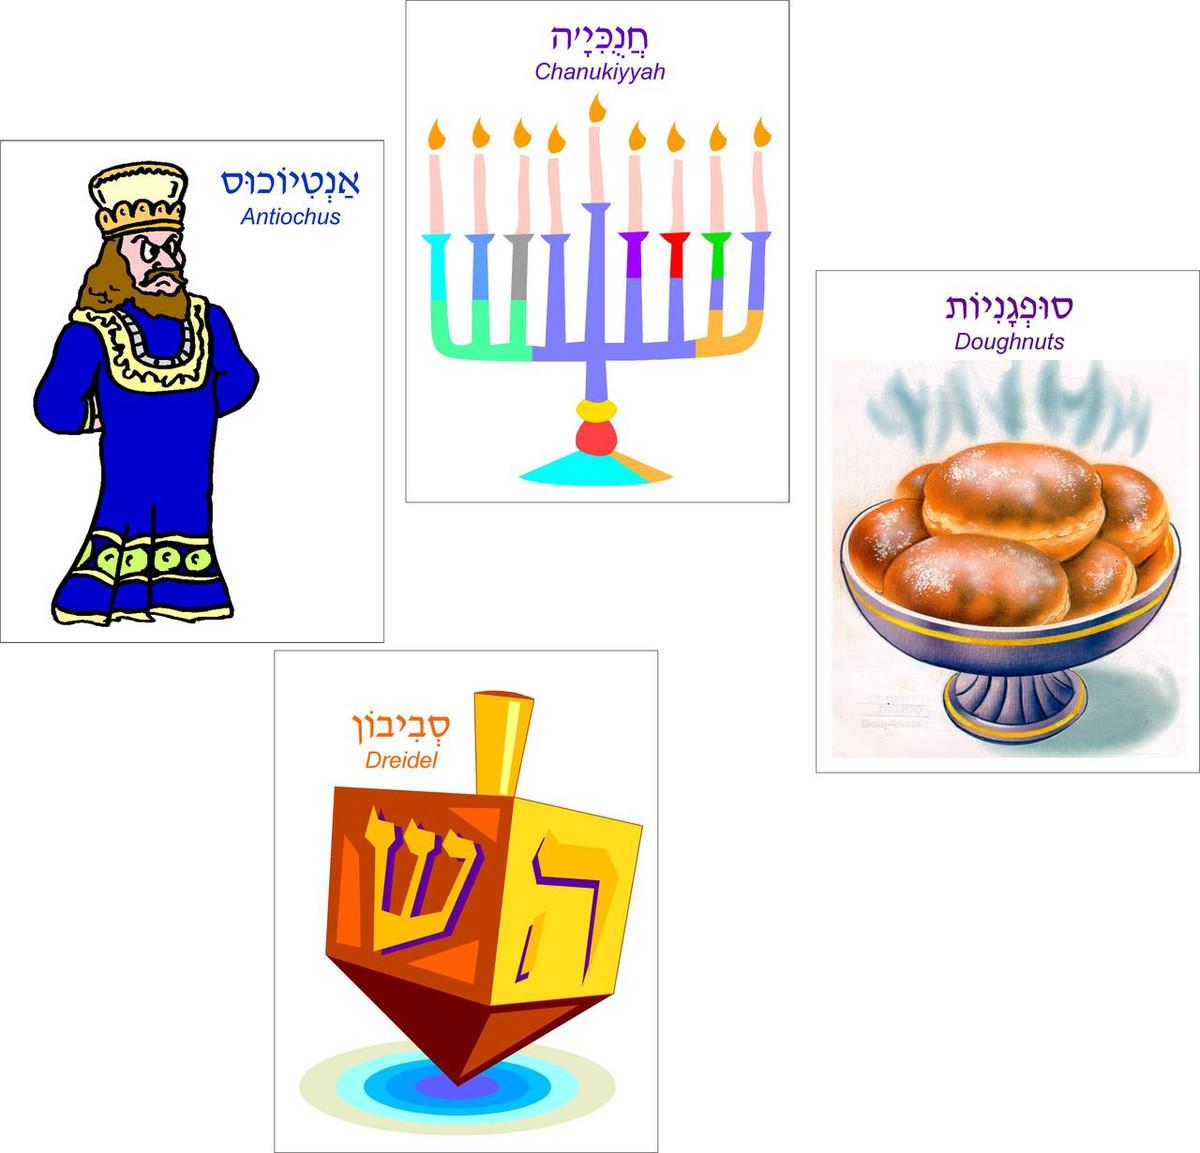 Uncategorized Chanukah Symbols characters and symbols jecc marketplace symbols